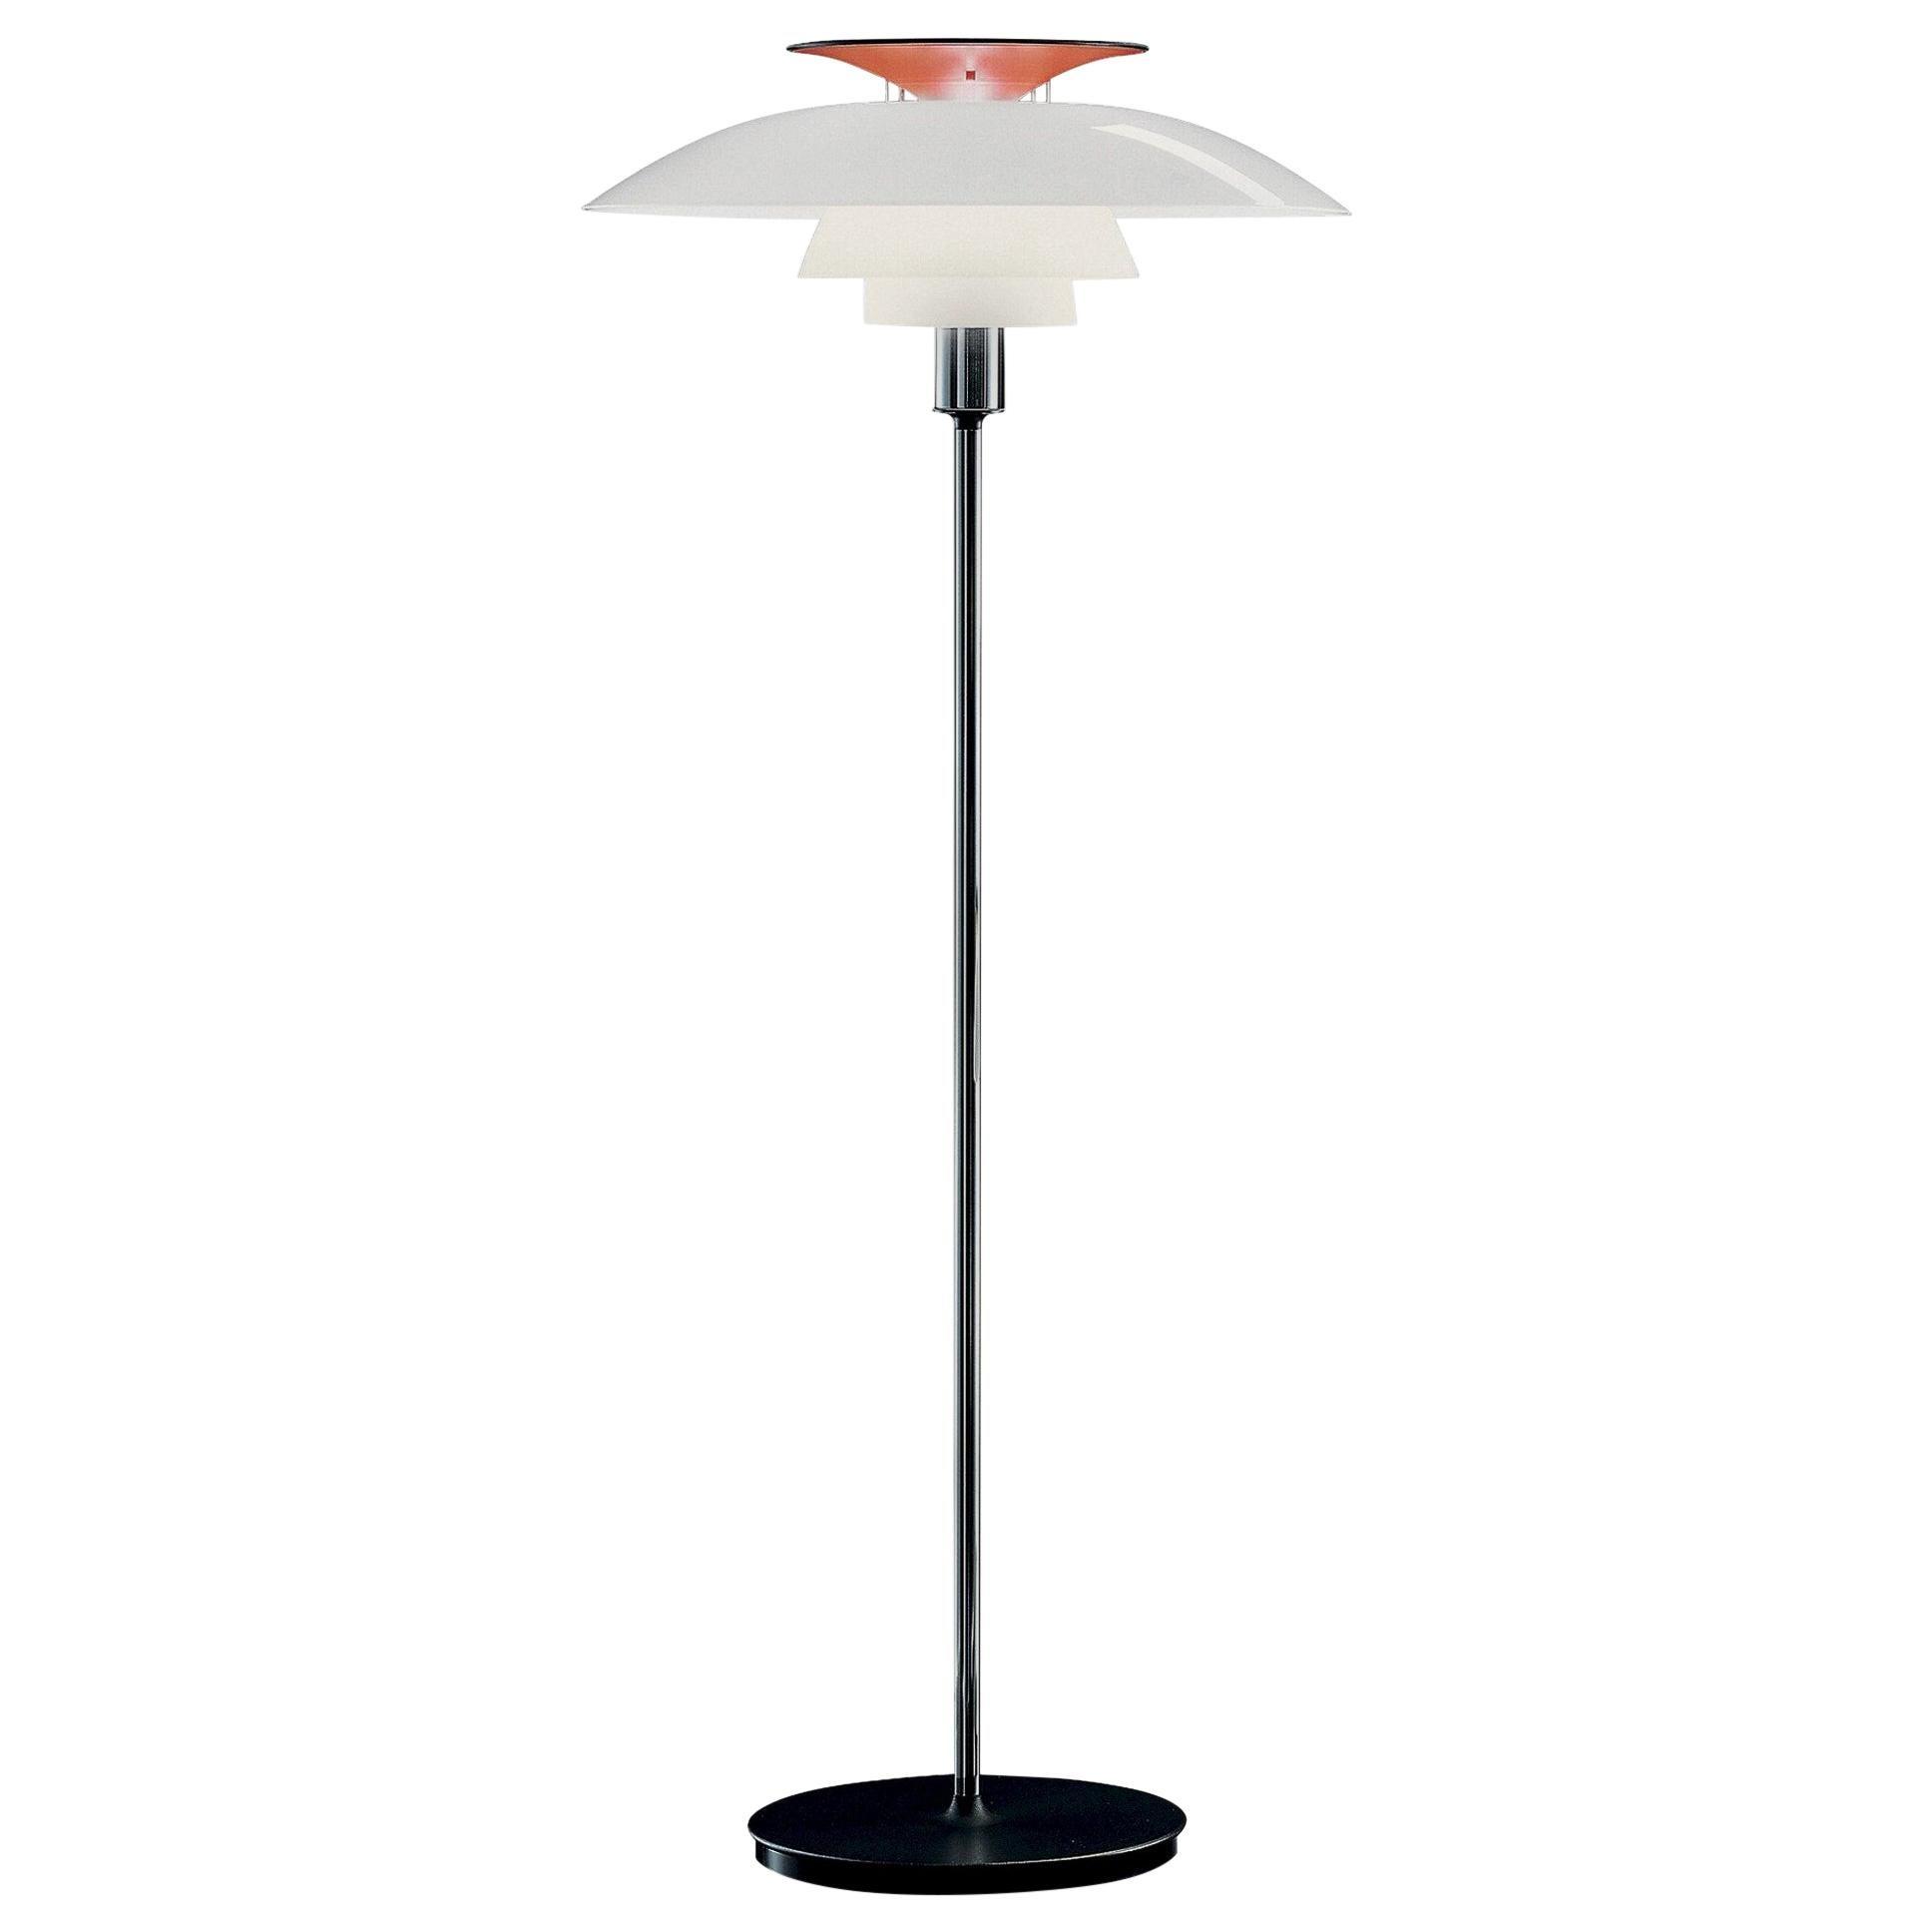 PH 3 1/2 - 2 1/2 Floor Lamp